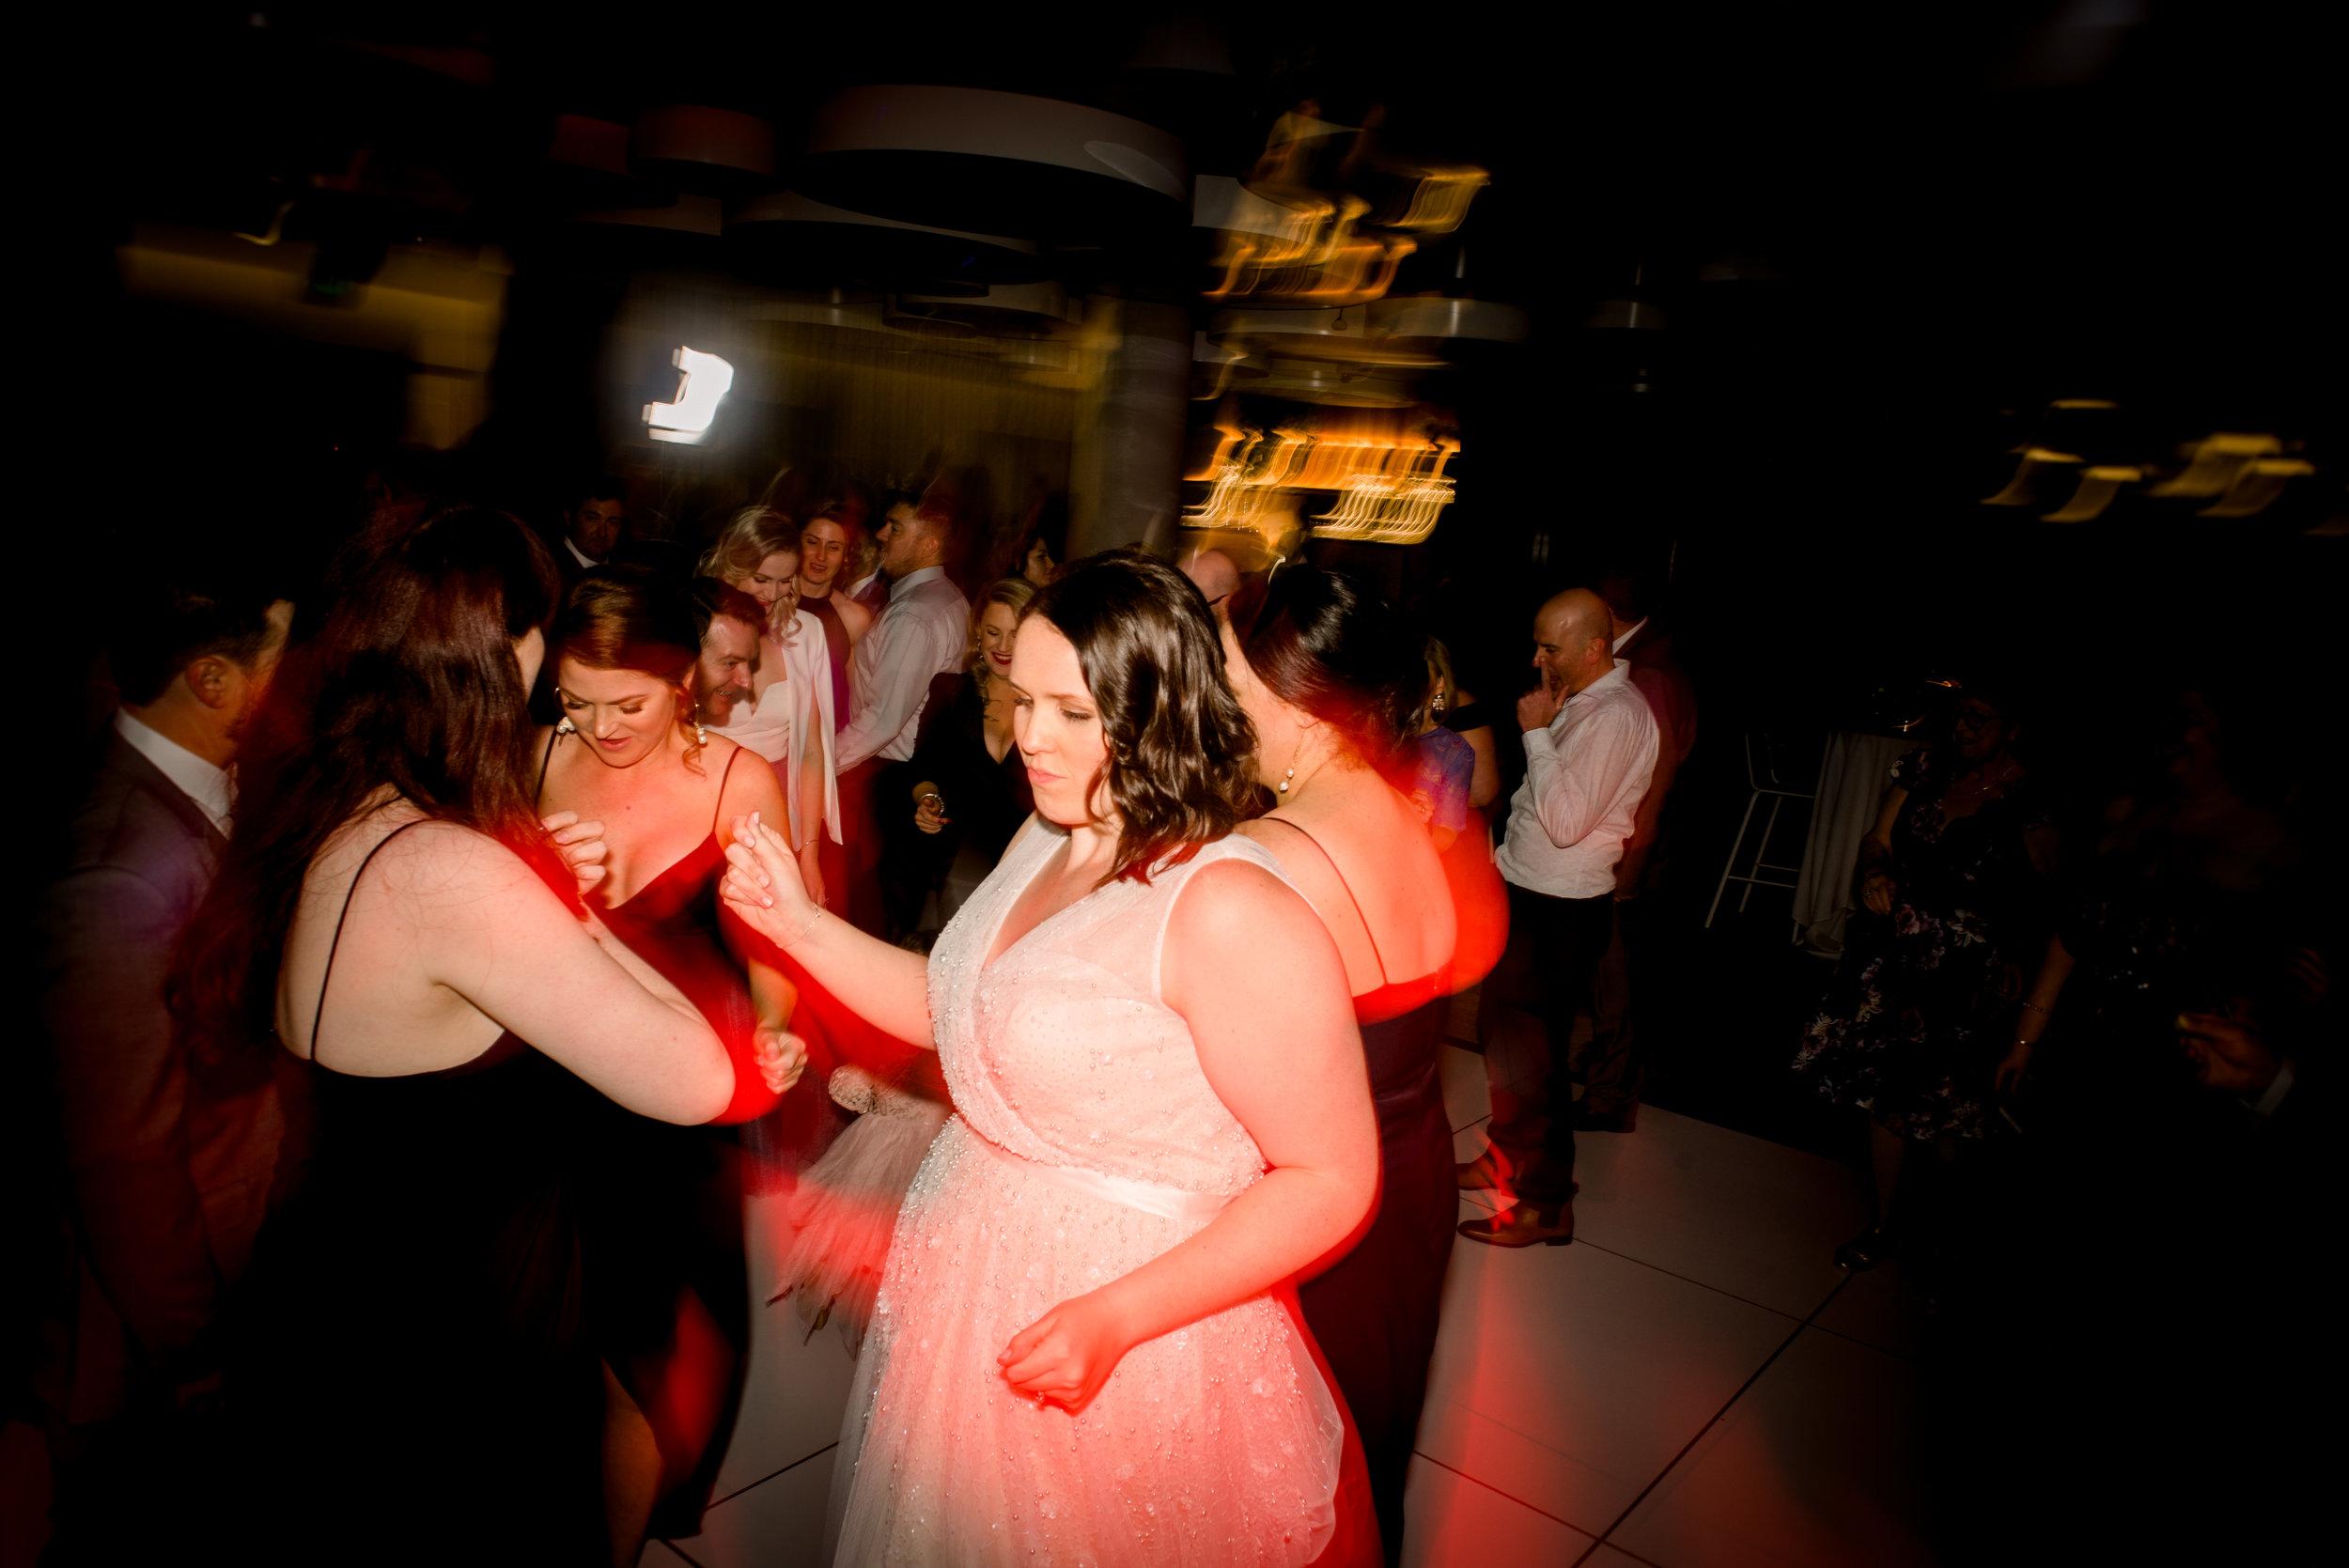 brisbane-city-wedding-photographer-romantic-wedding-120.jpg